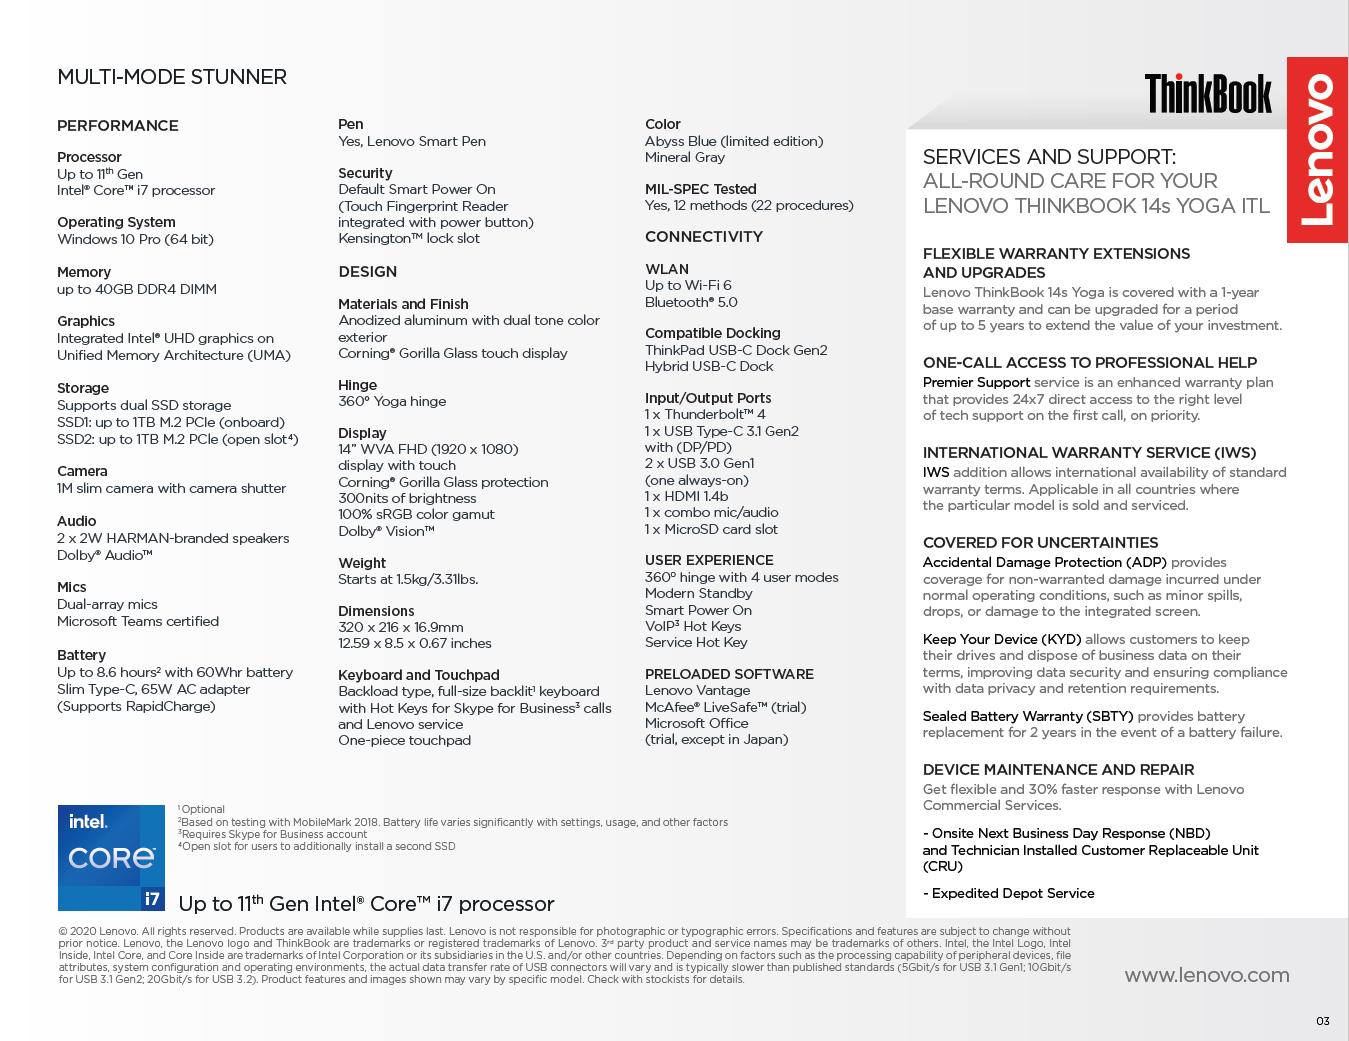 ThinkBook 14s Yoga ITL